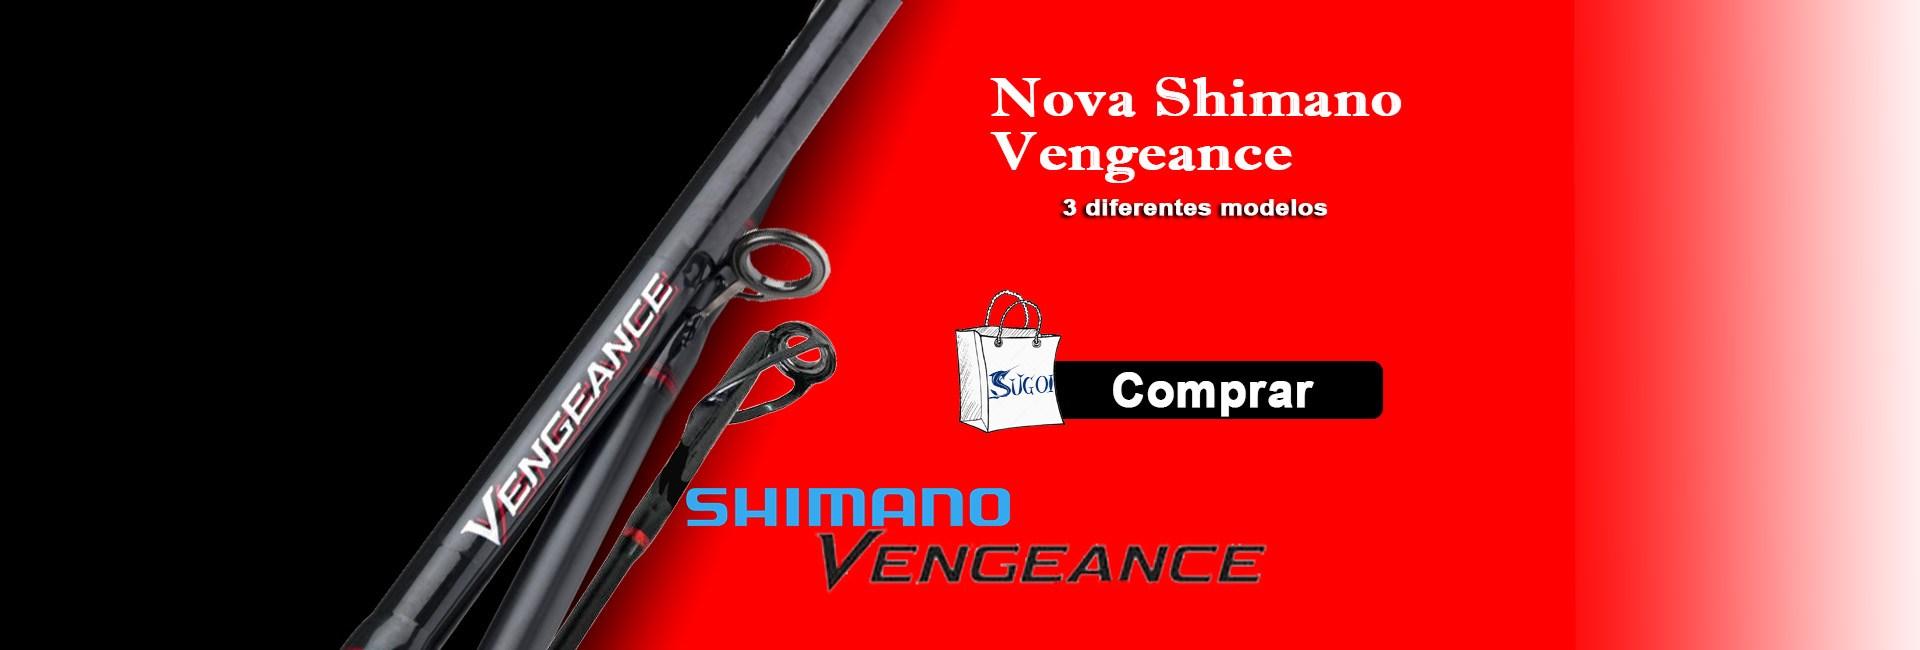 Vara shimano Vengeance